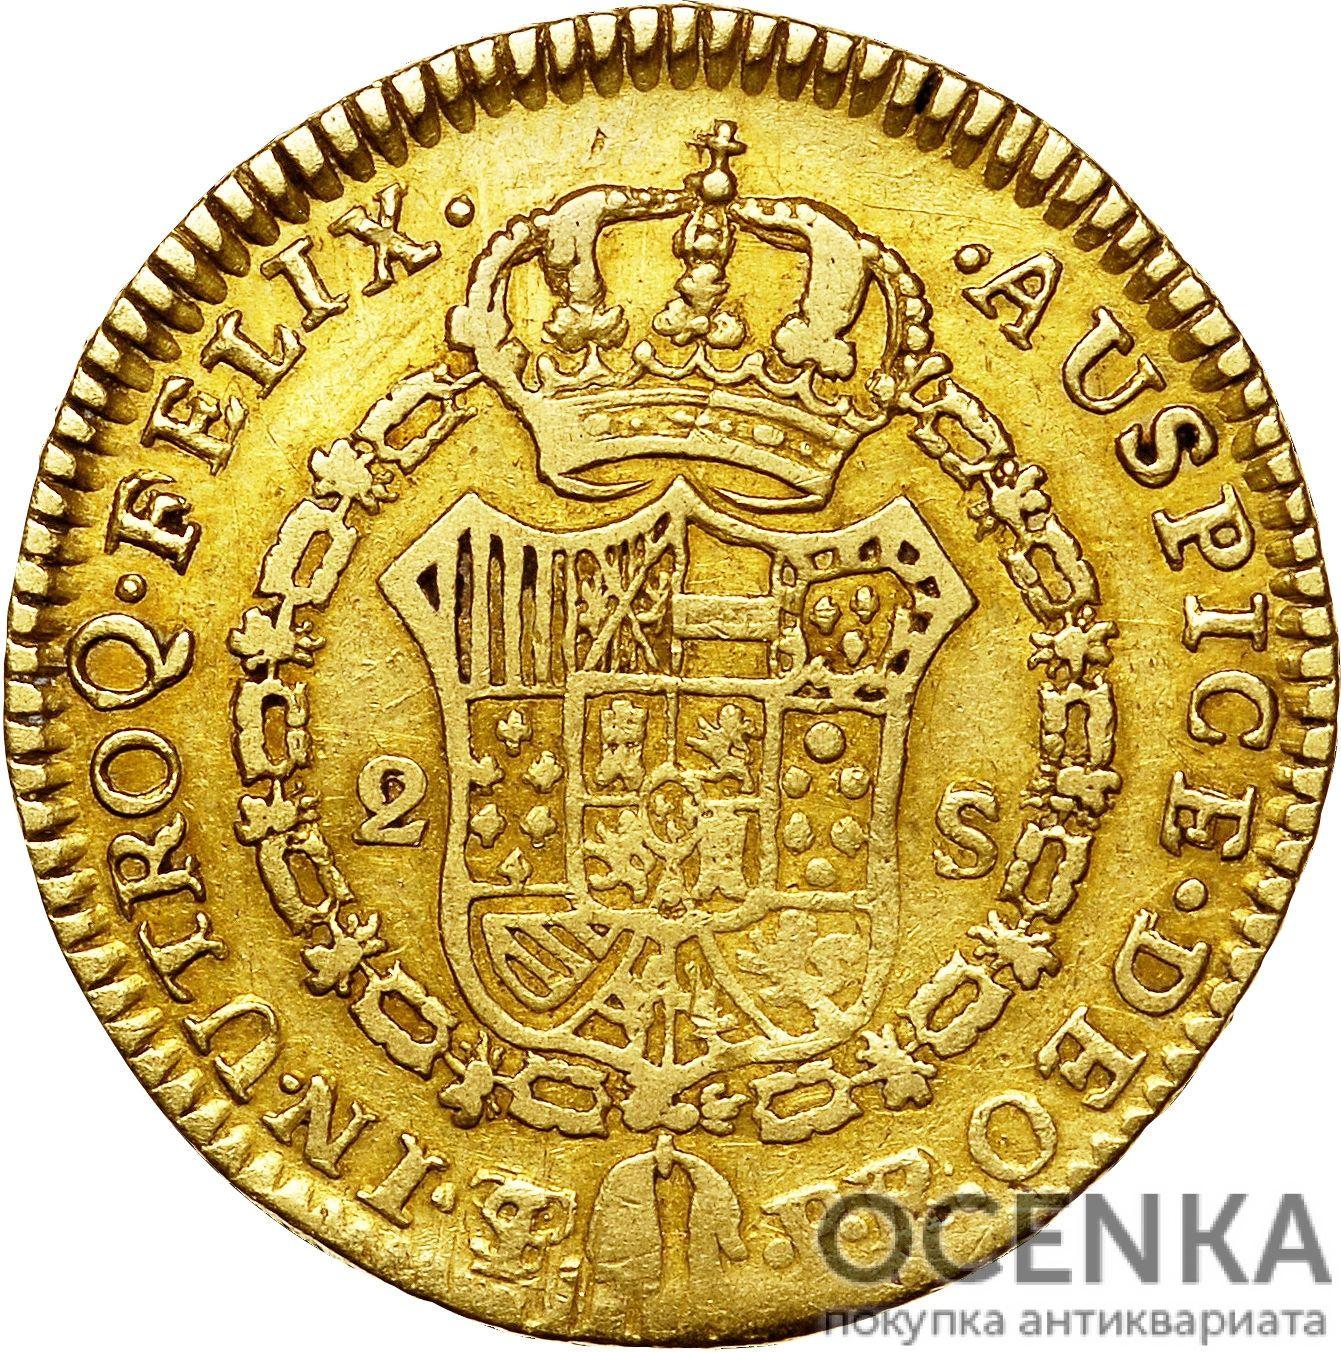 Золотая монета 2 эскудо (2 Escudos) Боливия